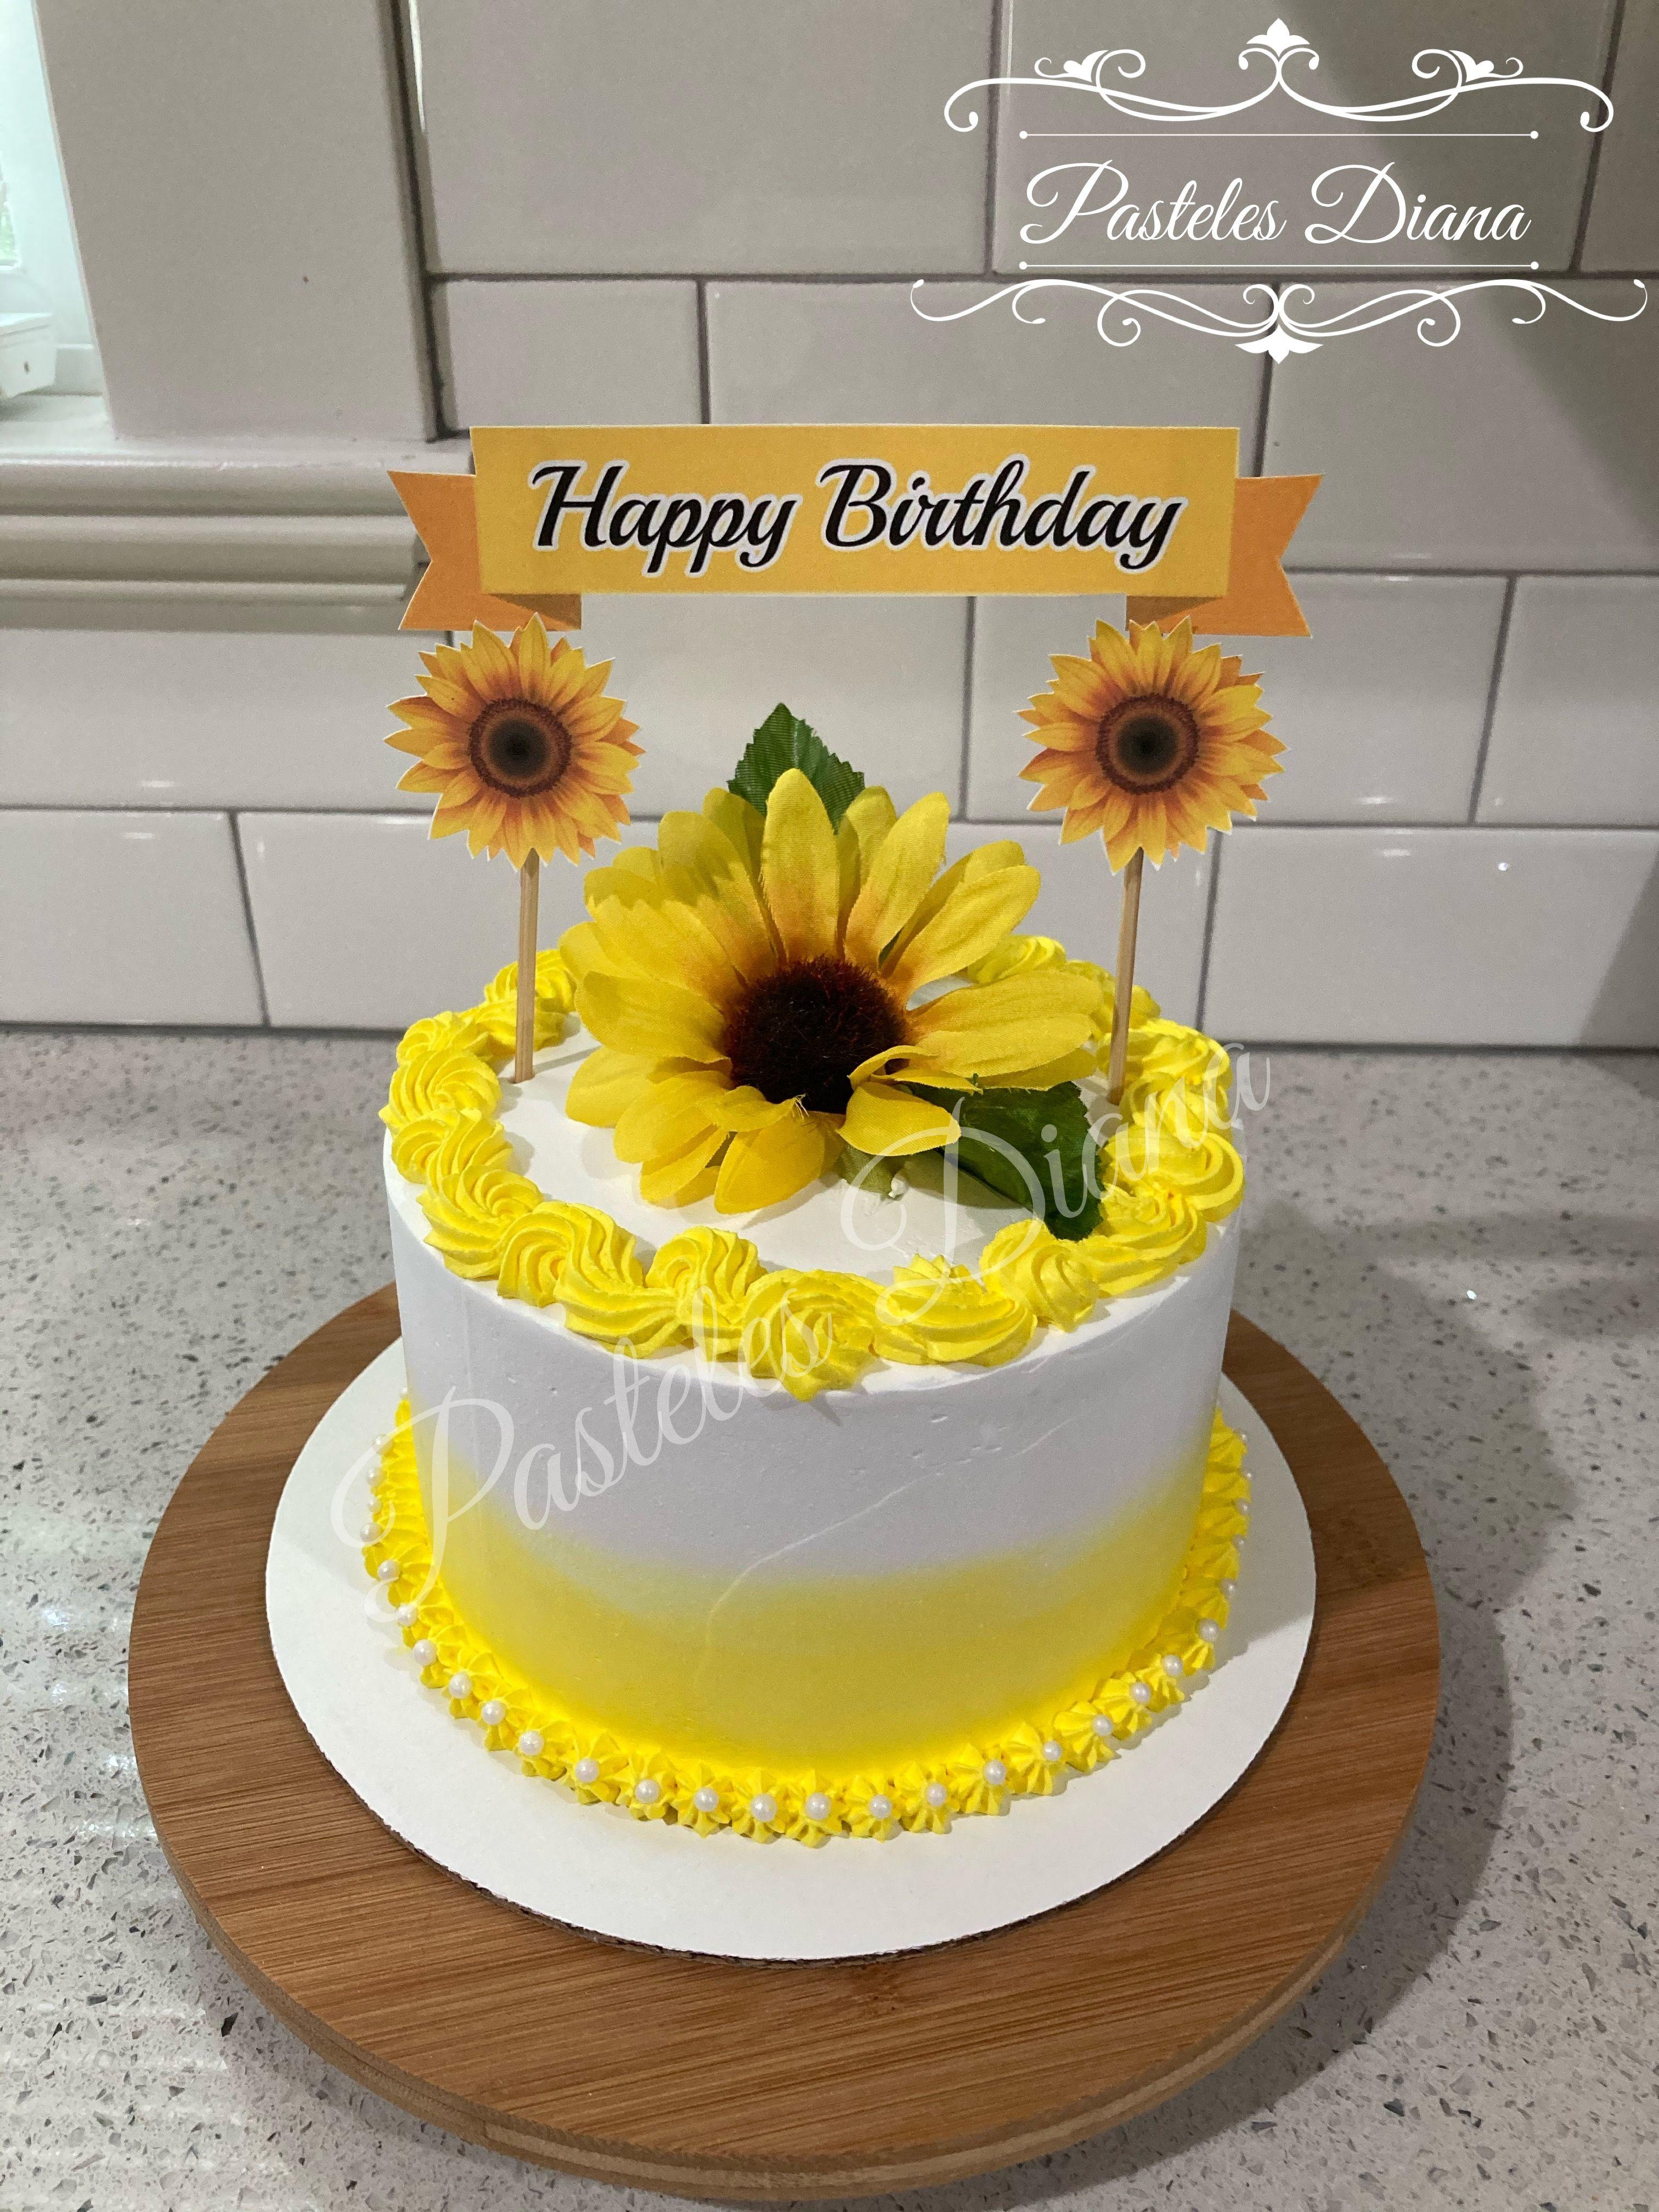 Pastel De Girasol Desserts Cake Food